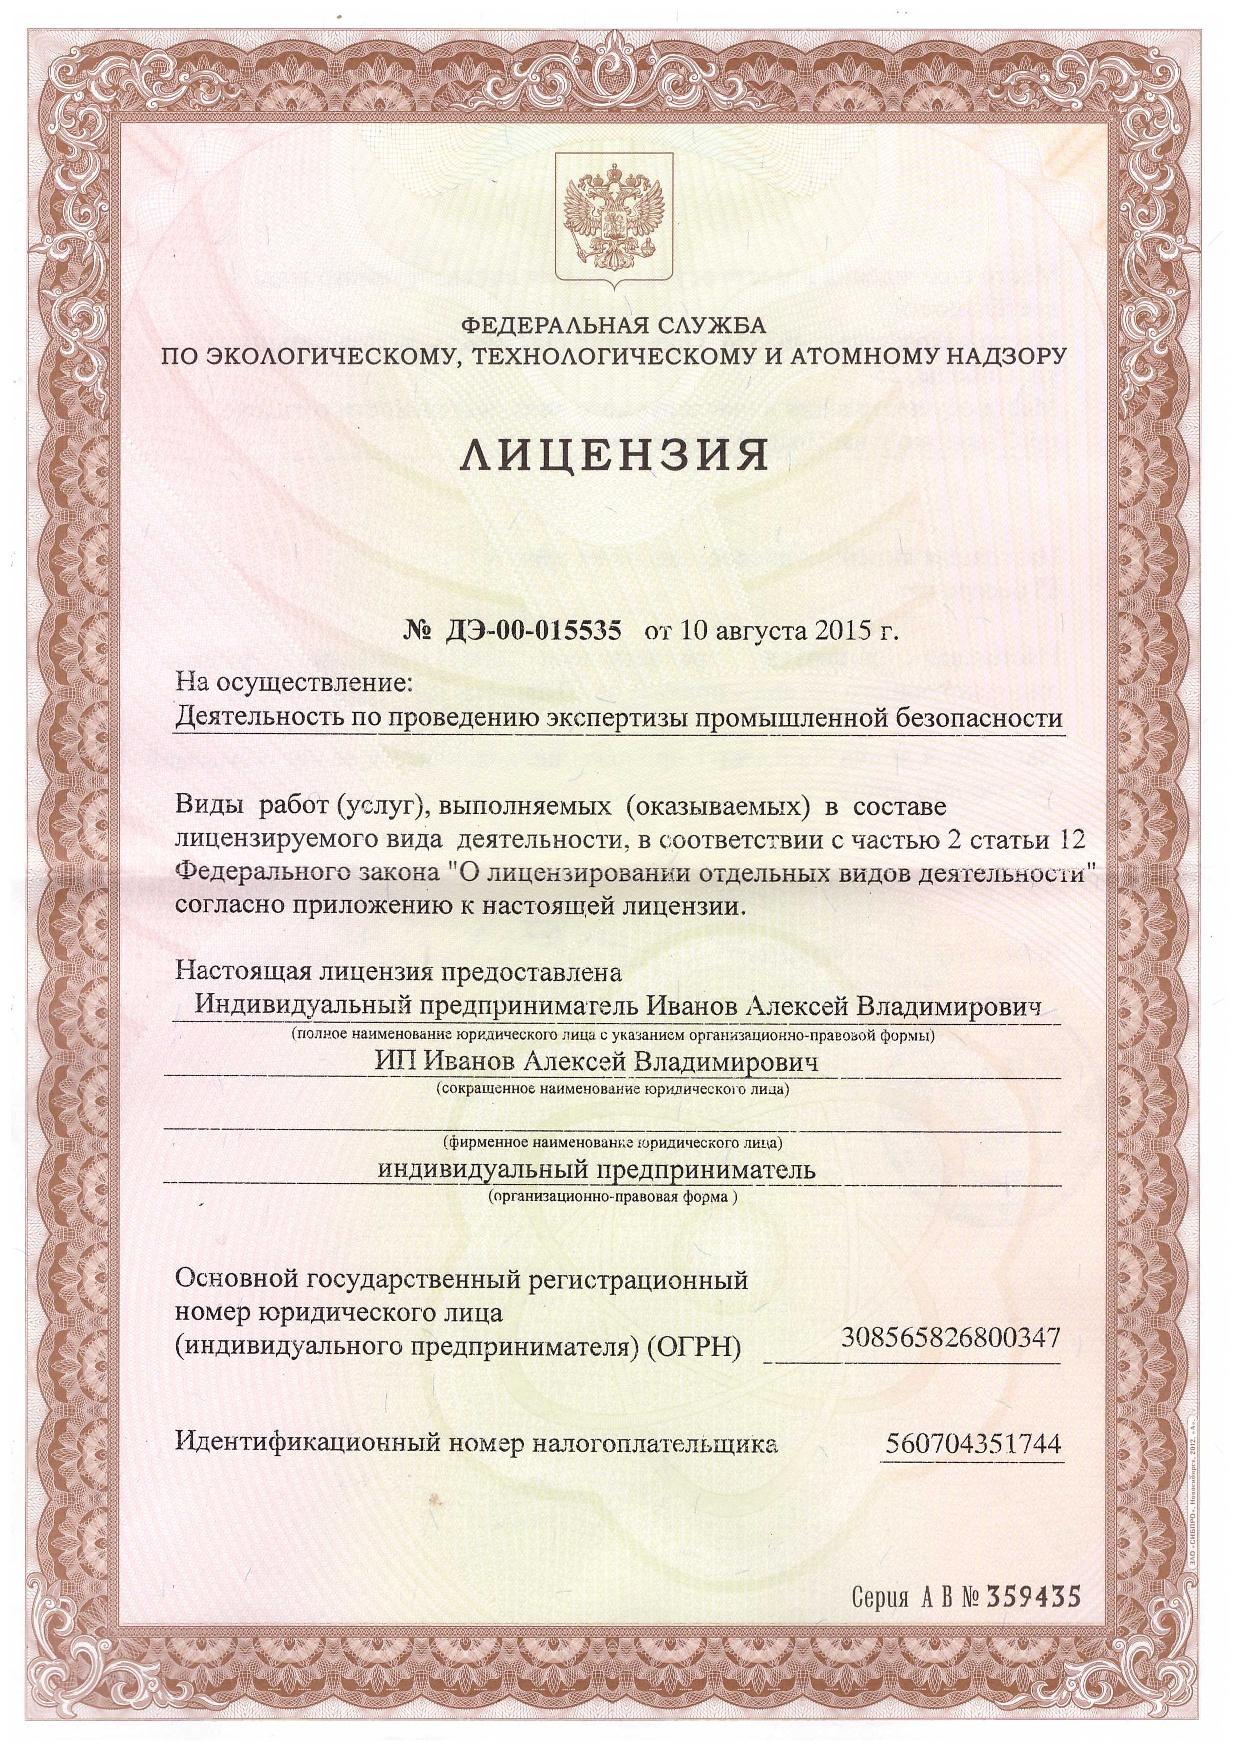 http://ivanov56.ru/img/d763a798eebf462f8beb98651f097290.jpg